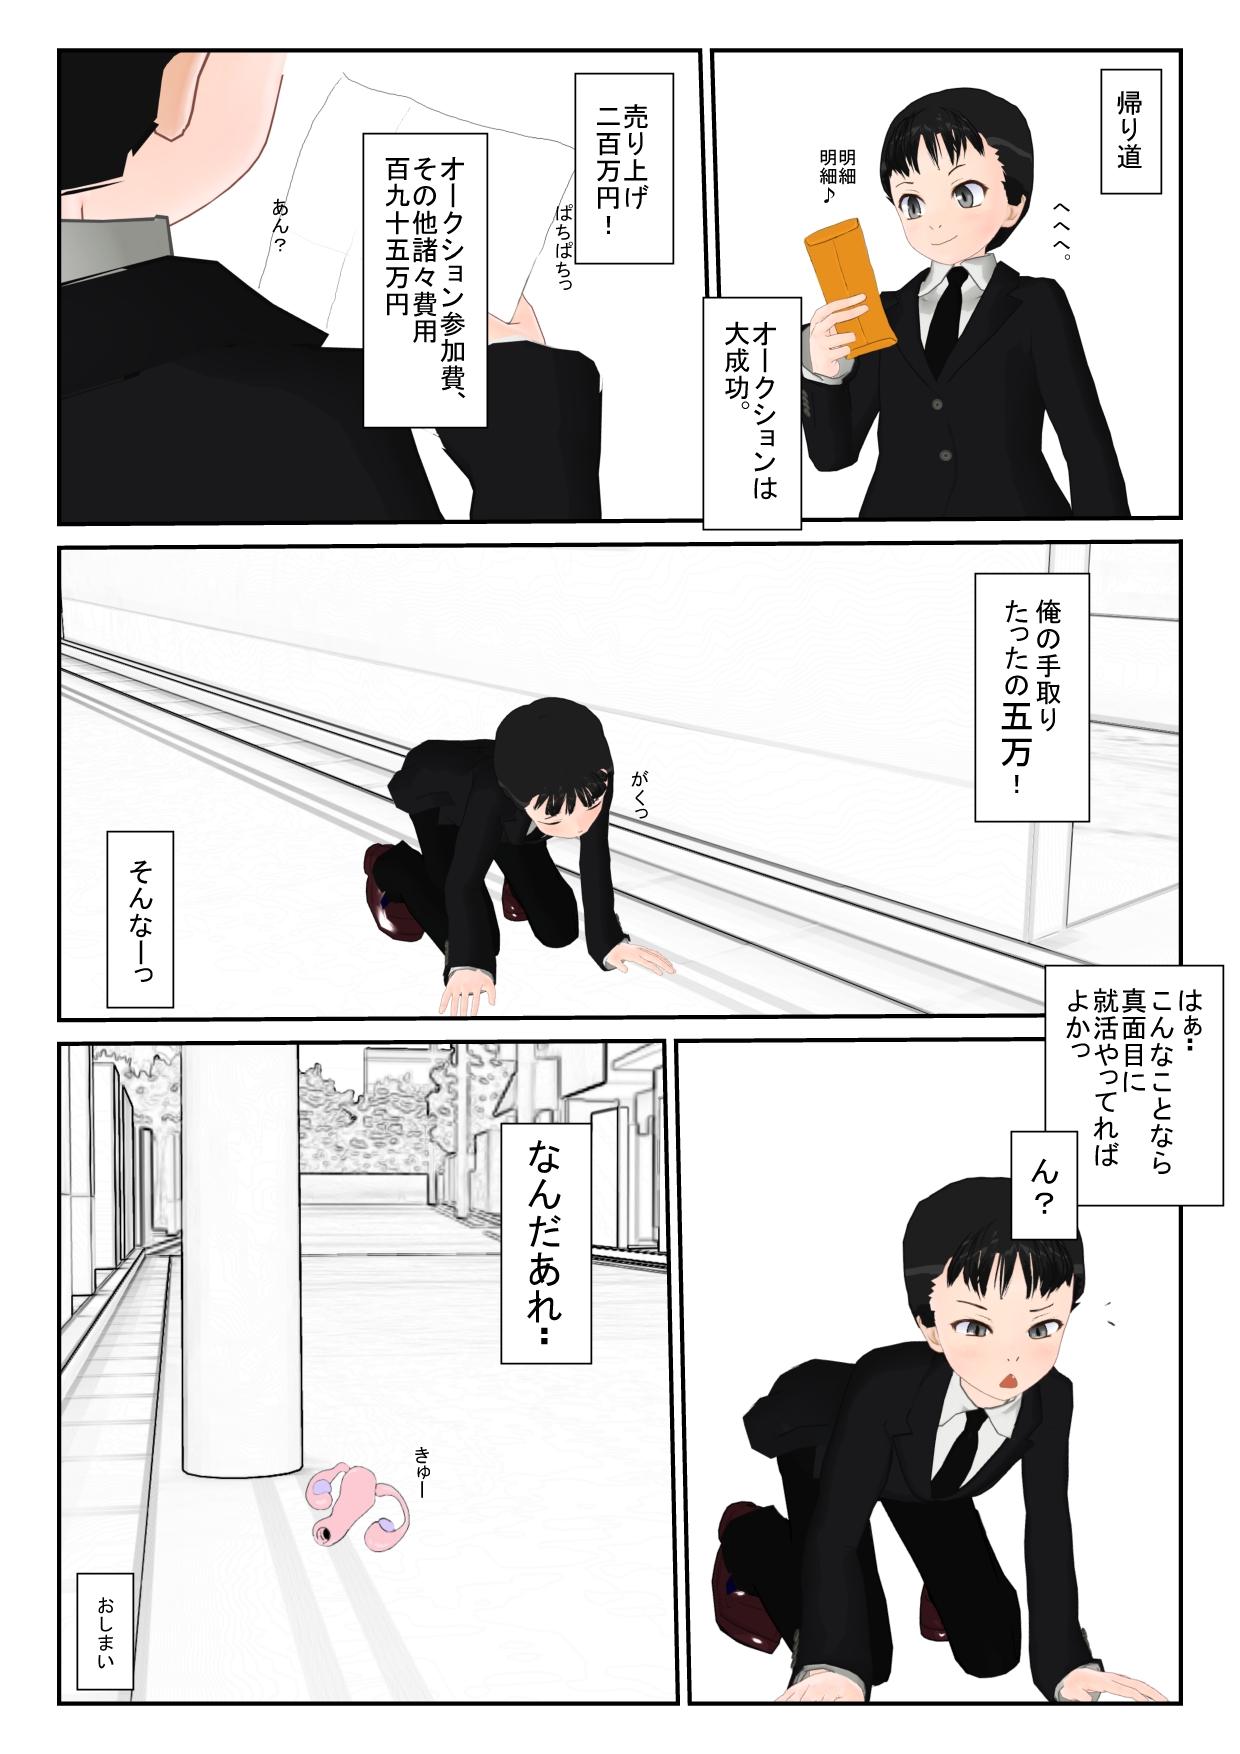 hirakuri0010.jpg